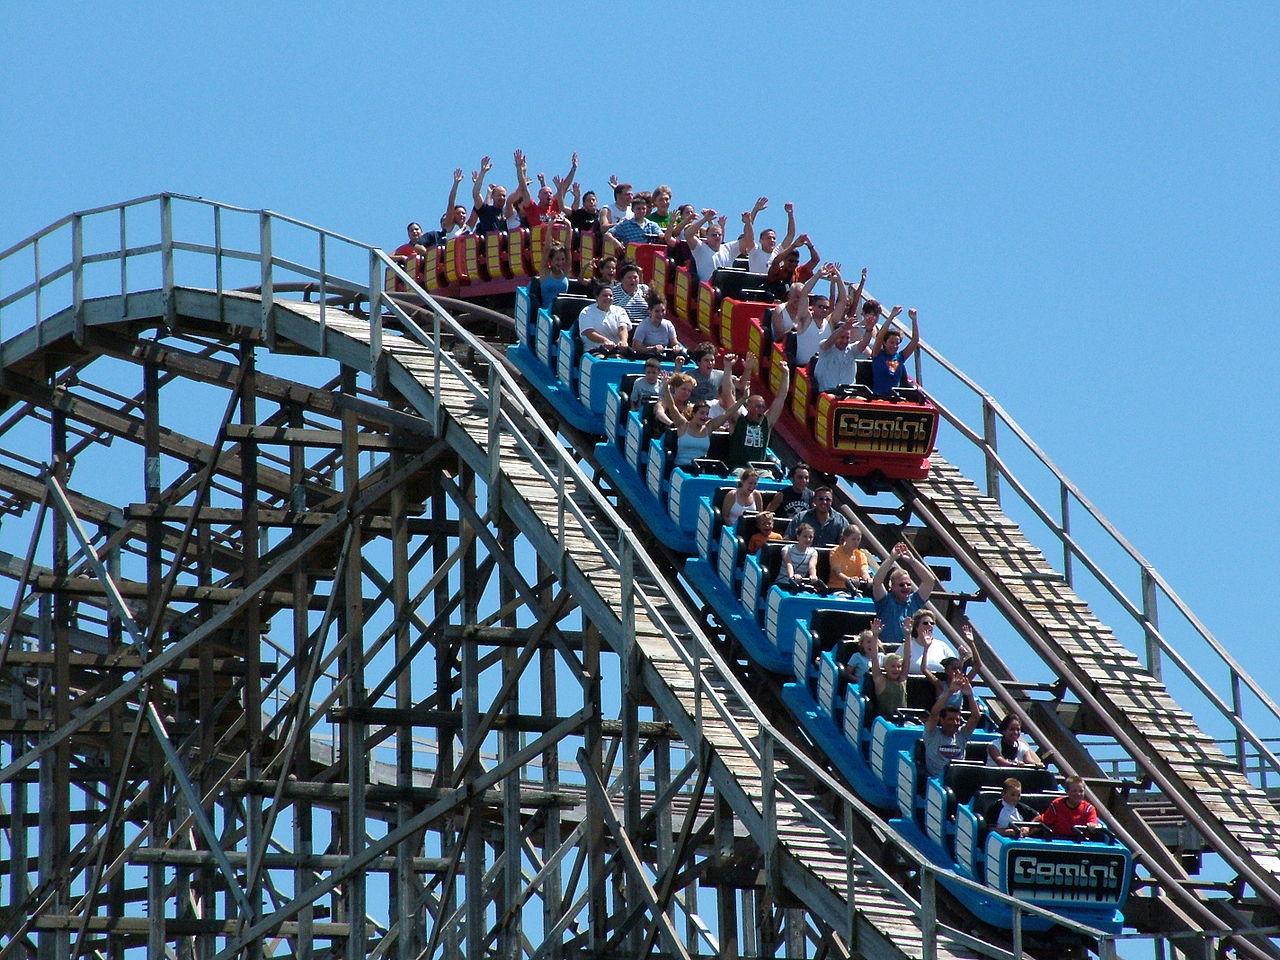 Cedar Point Amusement Park in Ohio